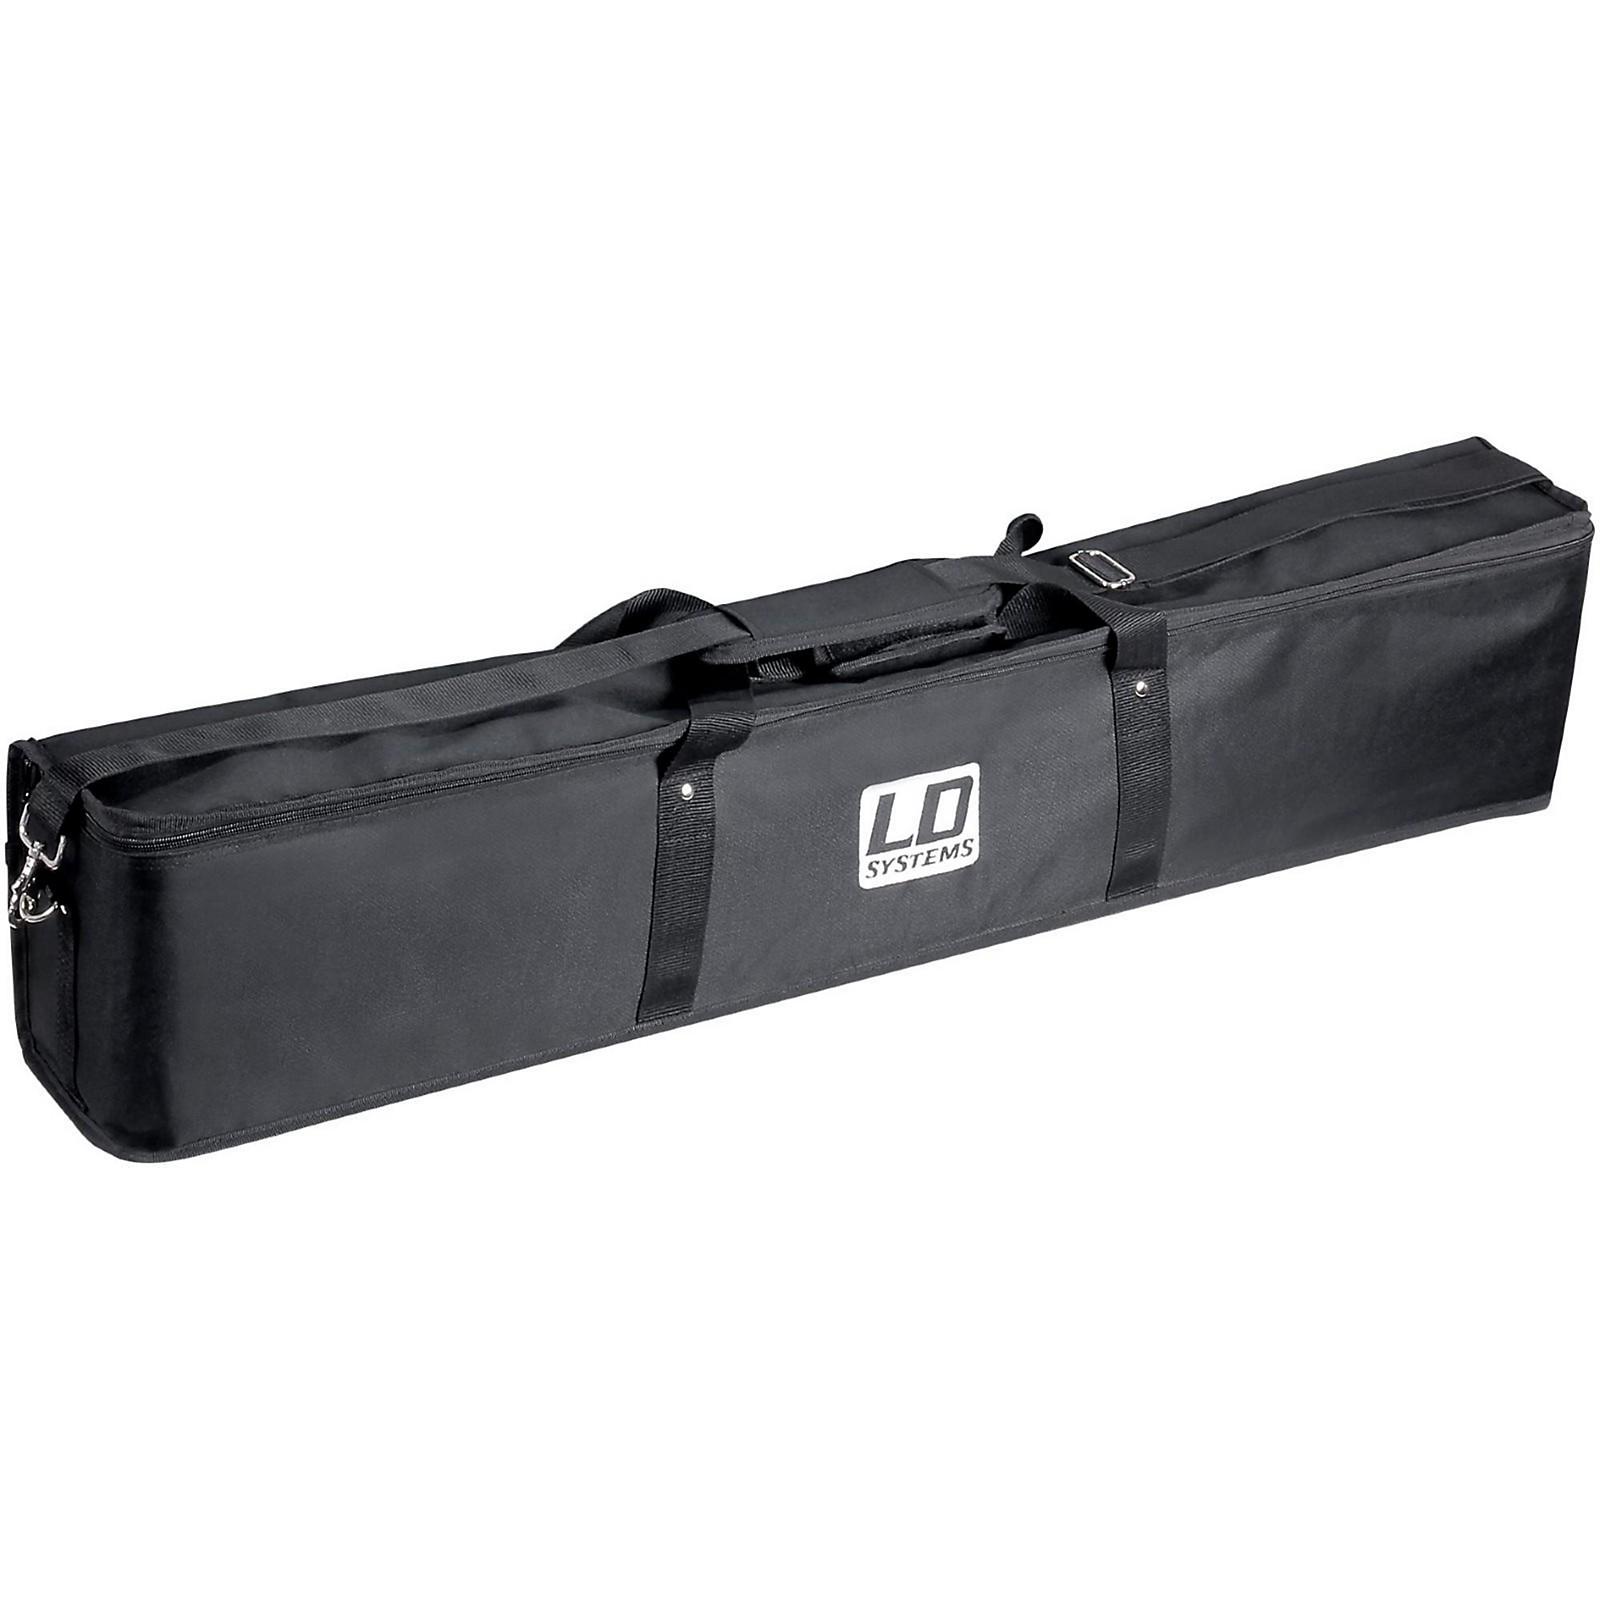 LD Systems MAUI 44 SAT Transport Bag